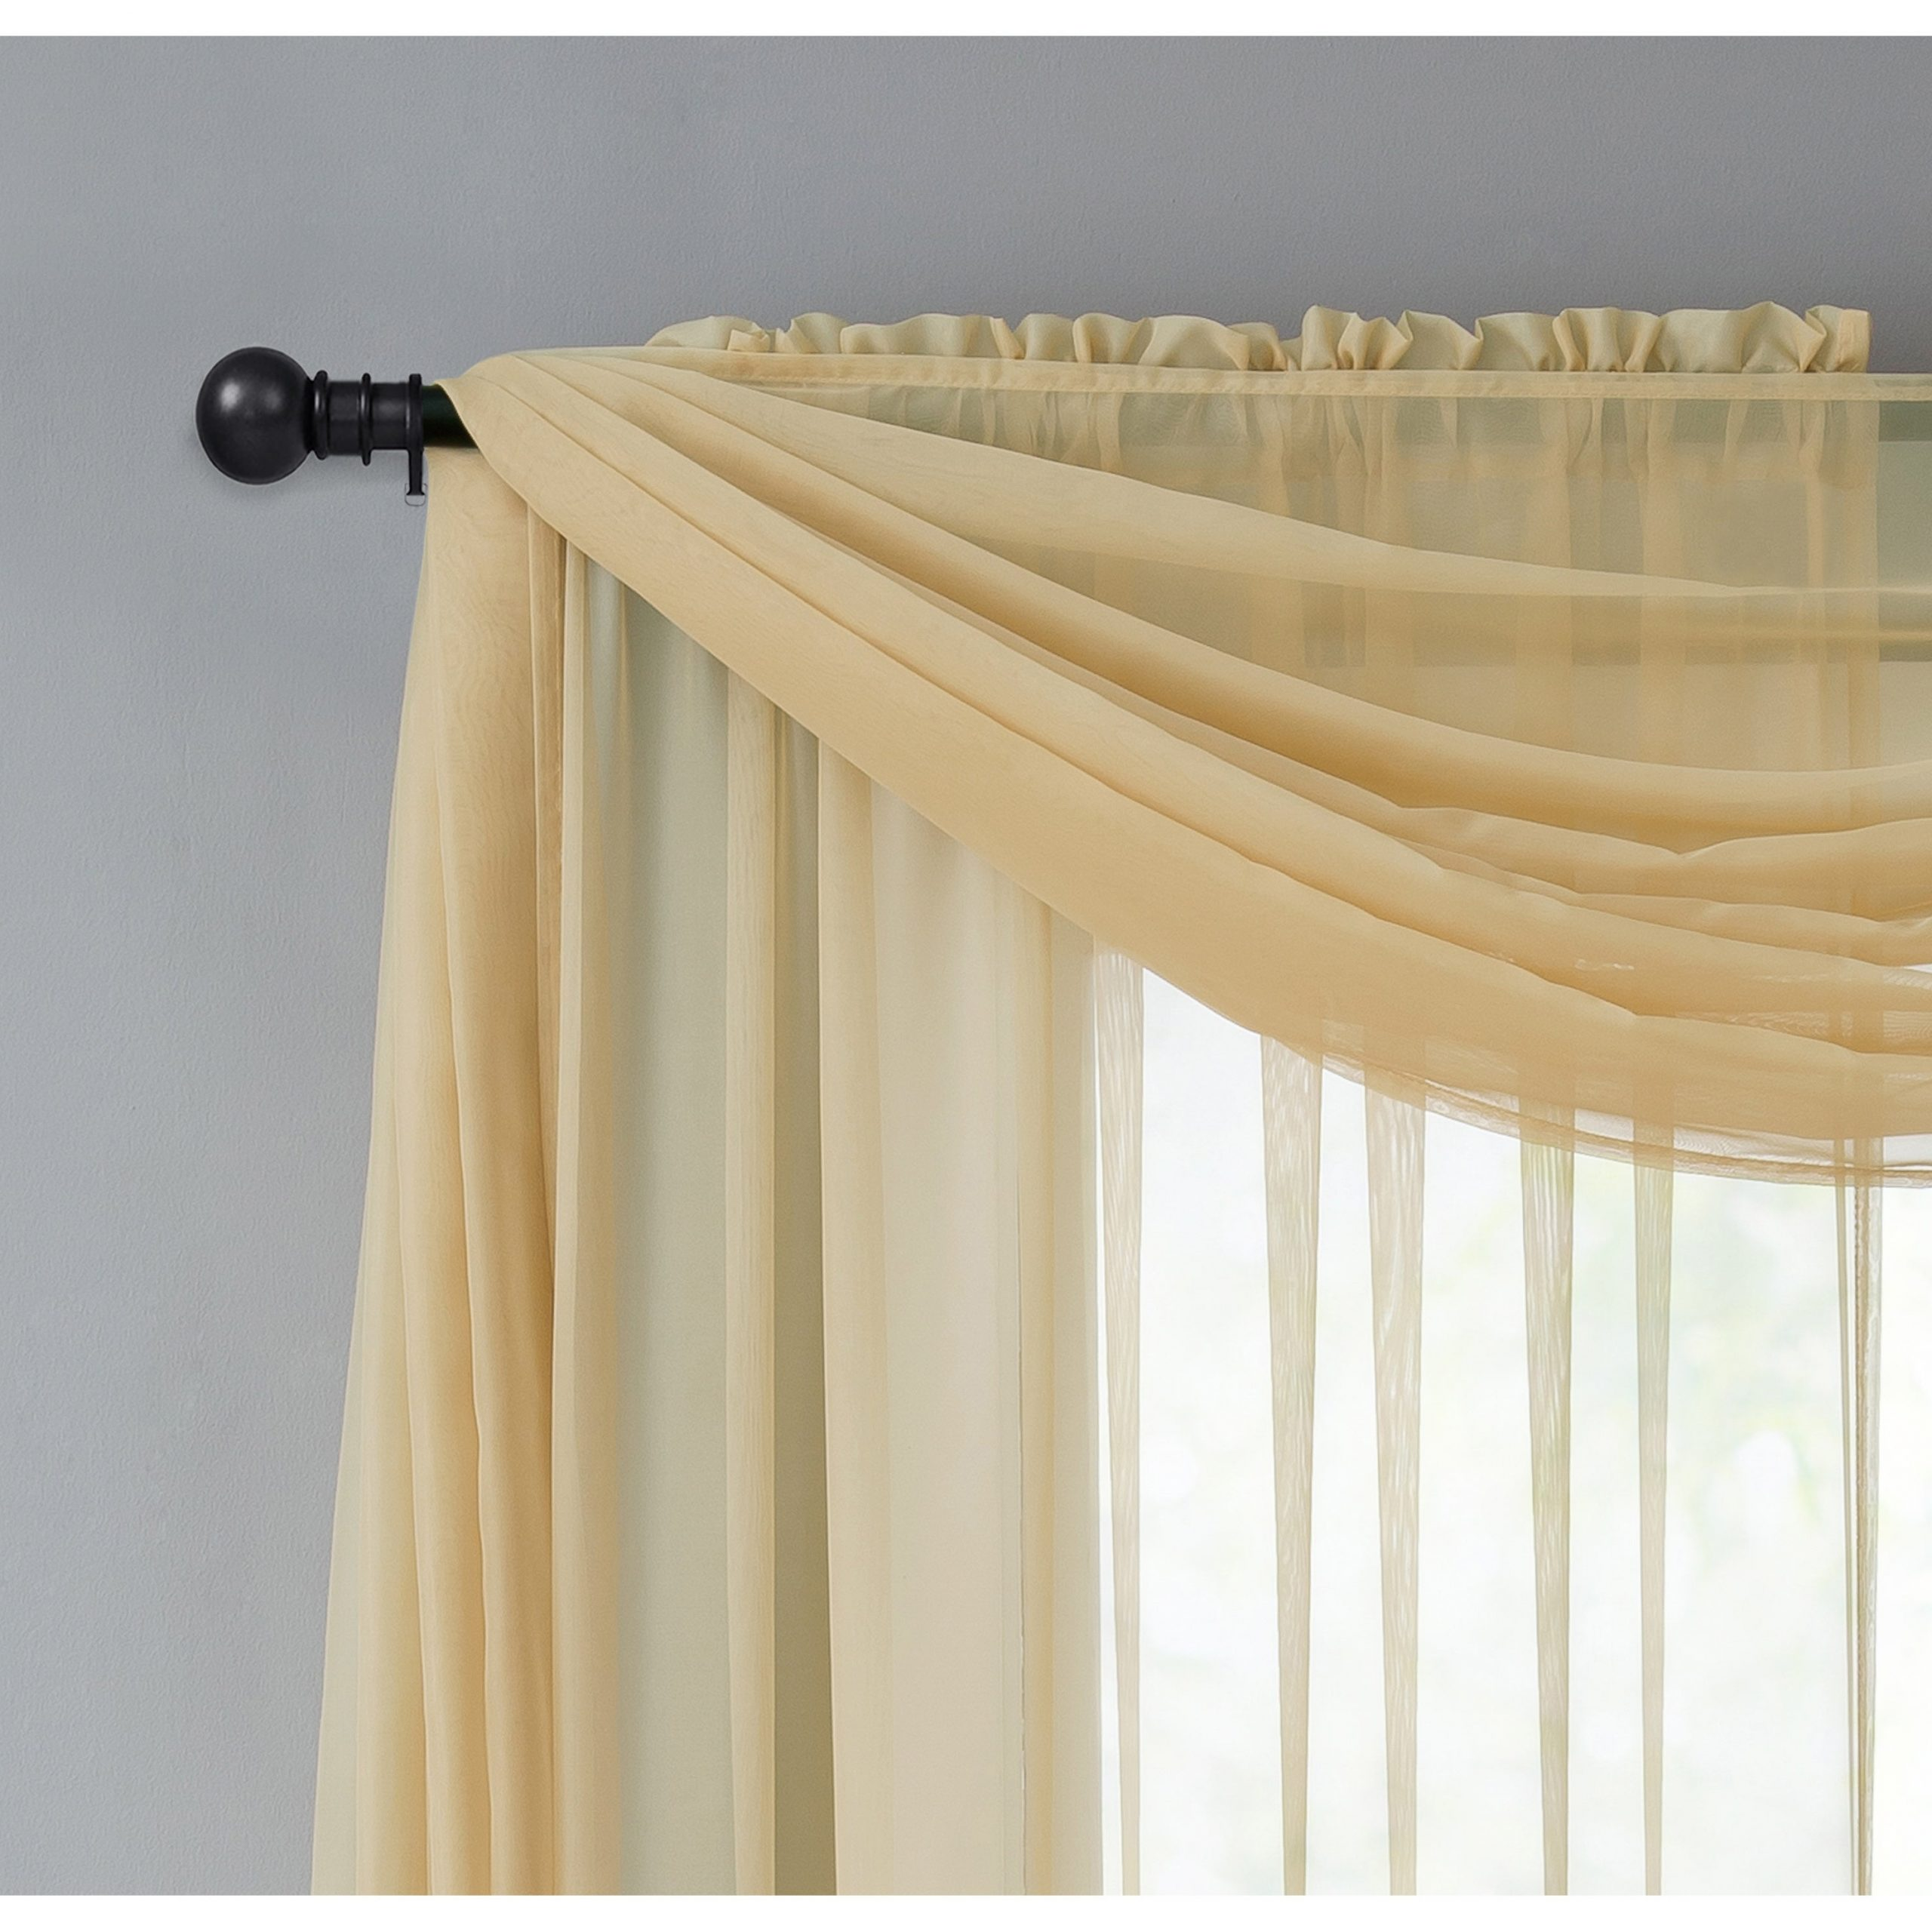 Vcny Infinity Sheer Rod Pocket Curtain Panel Throughout Preferred Infinity Sheer Rod Pocket Curtain Panels (View 11 of 20)